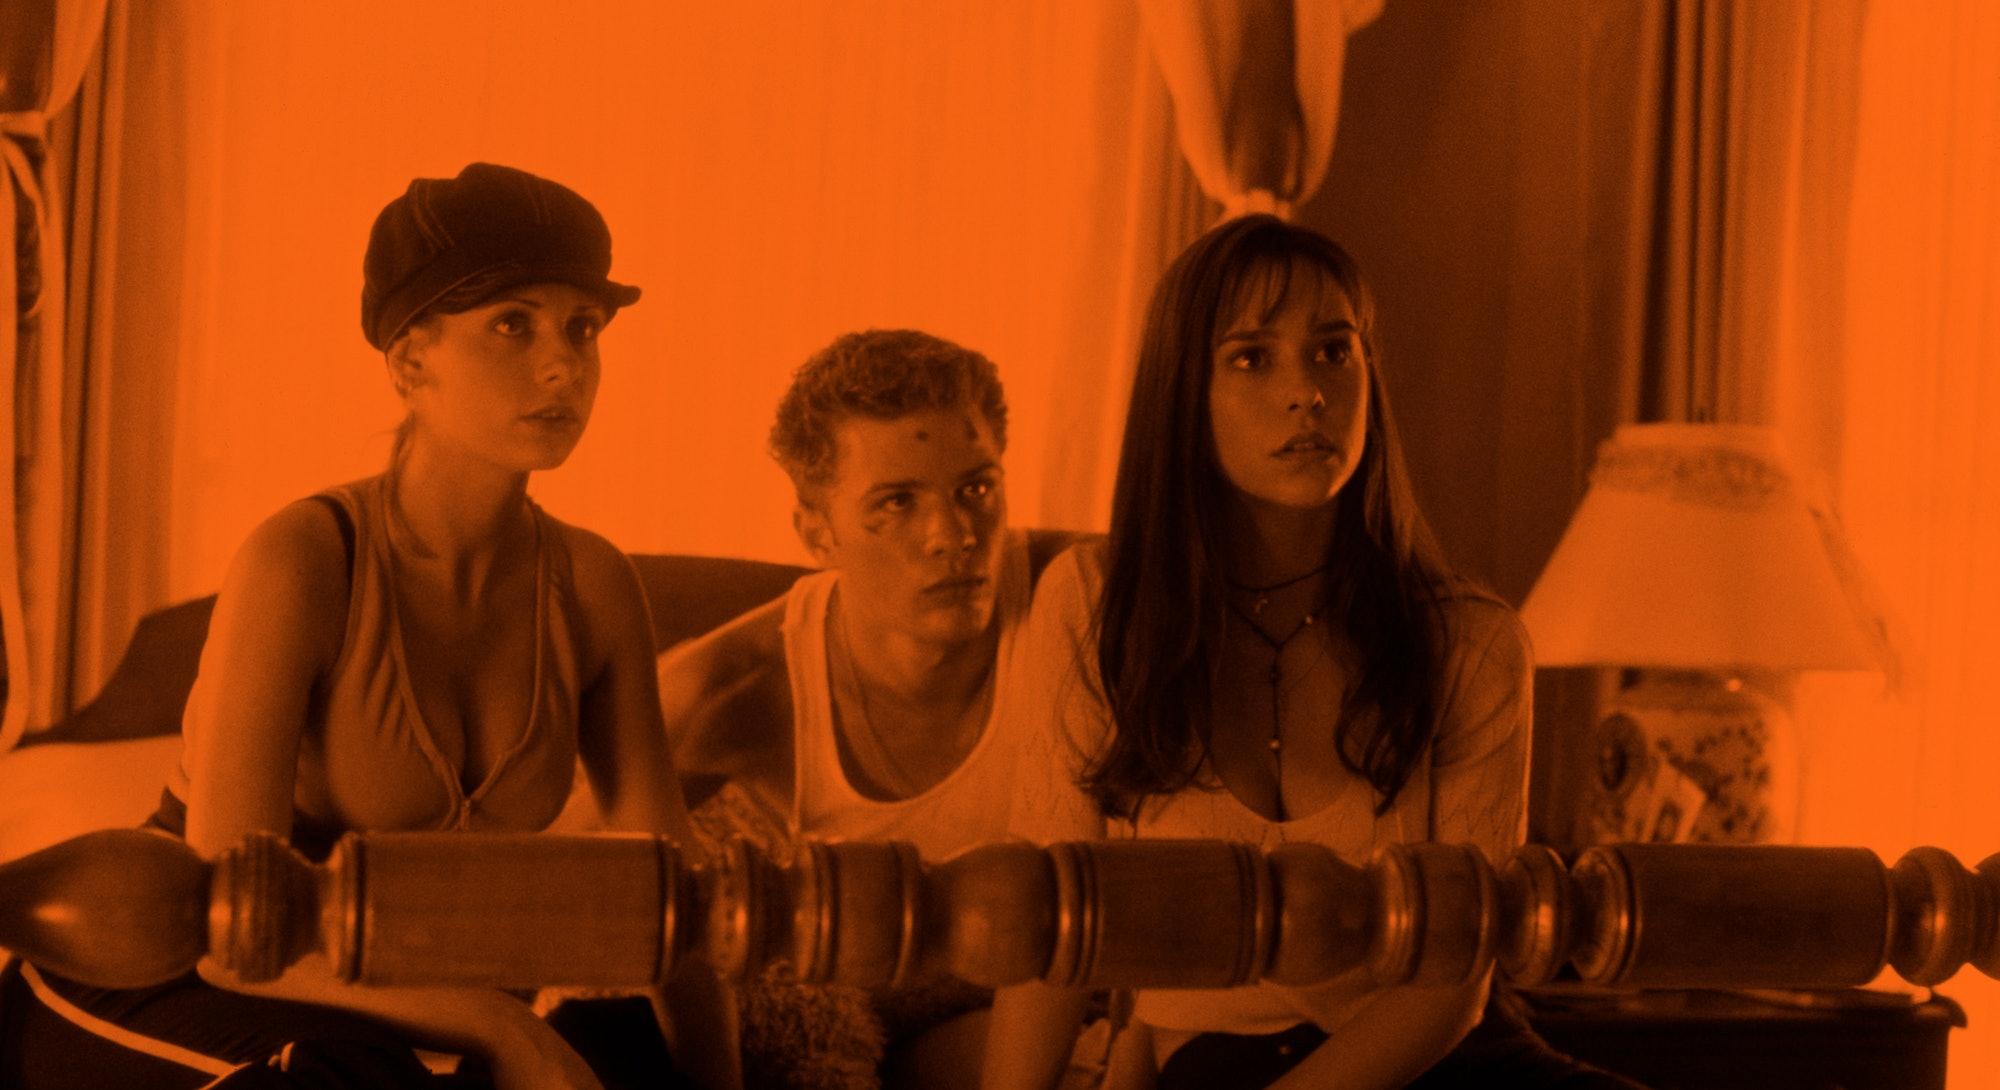 I Know What You Did Last Summer - 1997; Sarah Michelle Gellar, Ryan Phillippe, Jennifer Love Hewitt.